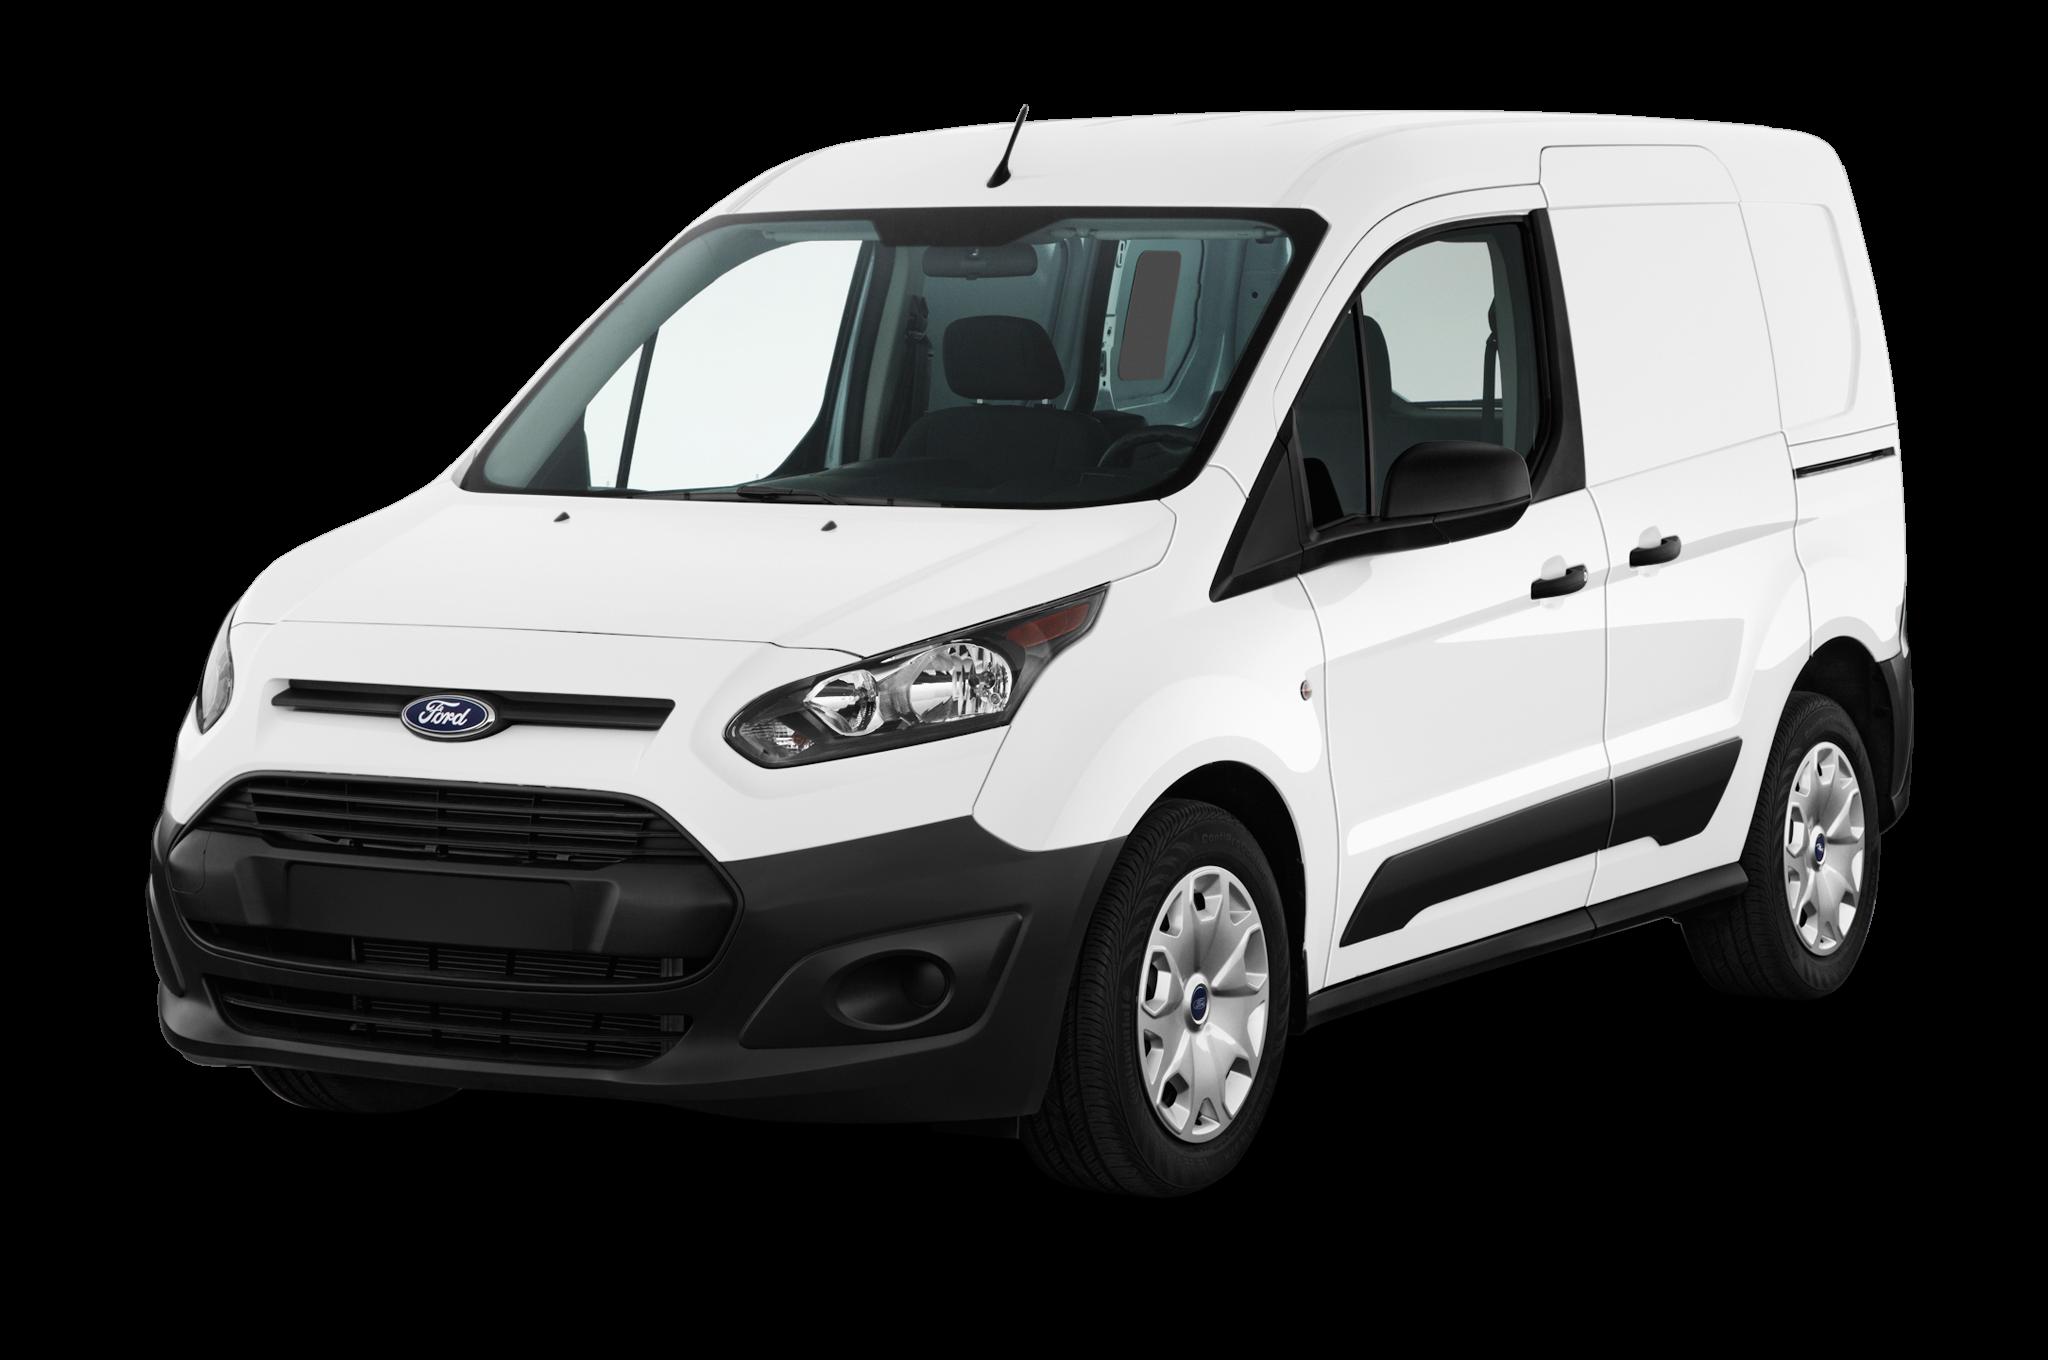 Ford Transit Connect Titanium Lwb Wagon 2017 International